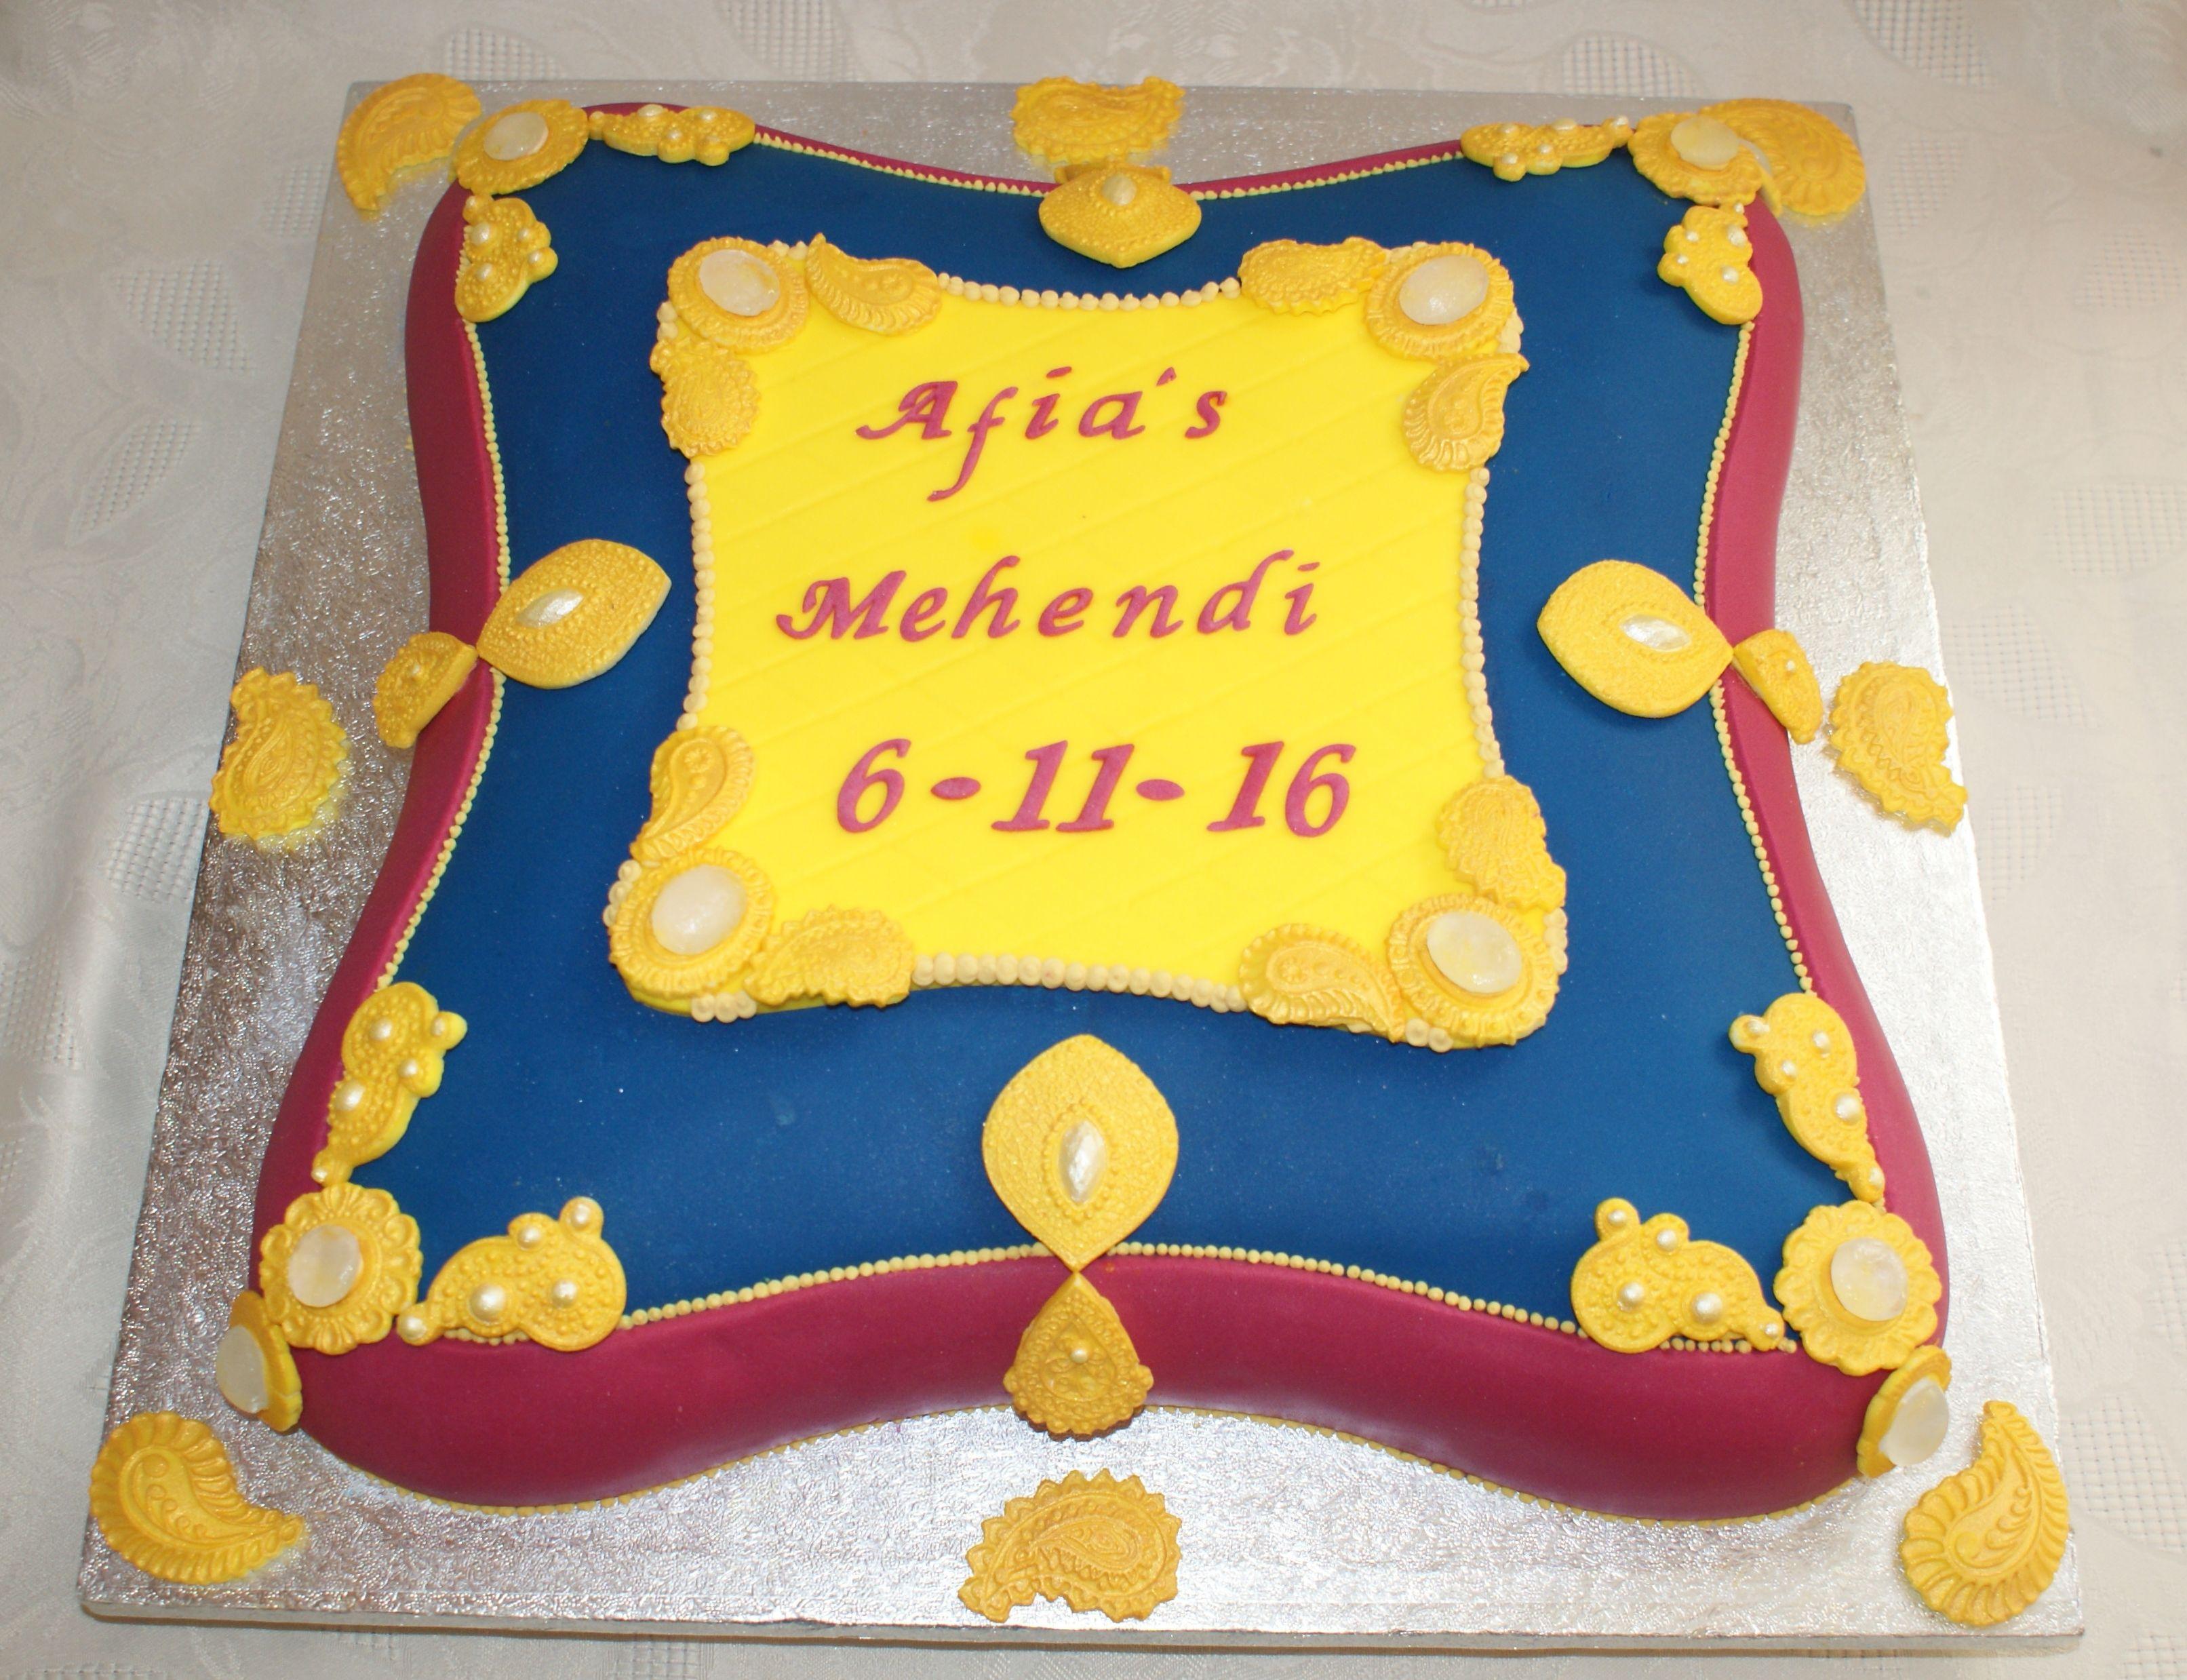 Mehndi Cushion Cake : Cushion shaped mehndi cake with gold brooch detail henna